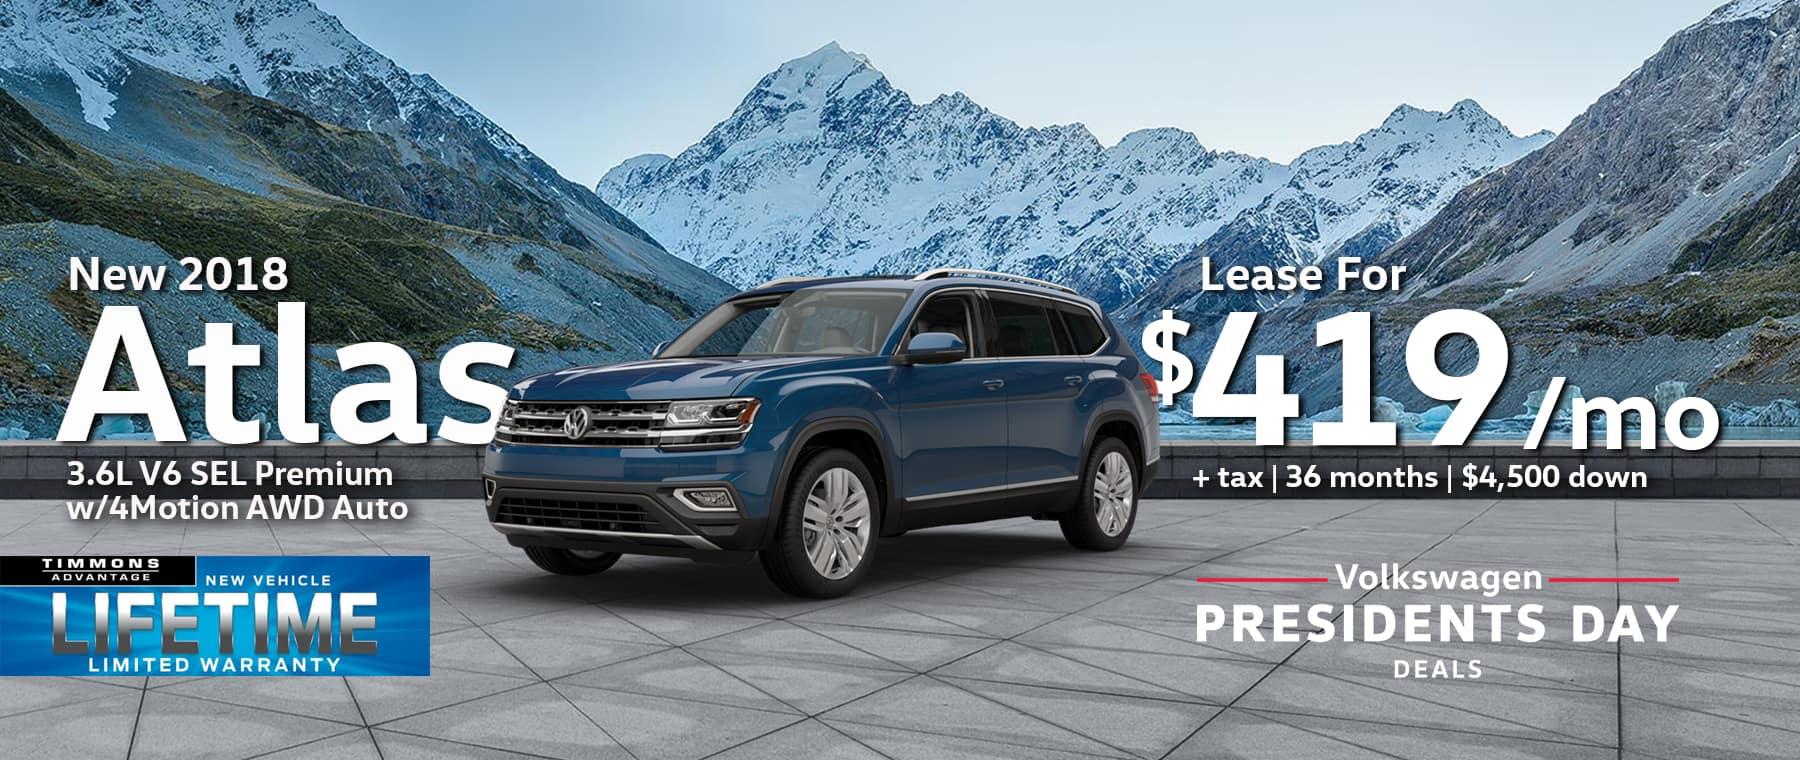 2018 Volkswagen Atlas 3.6L V6 SEL Premium w/4Motion